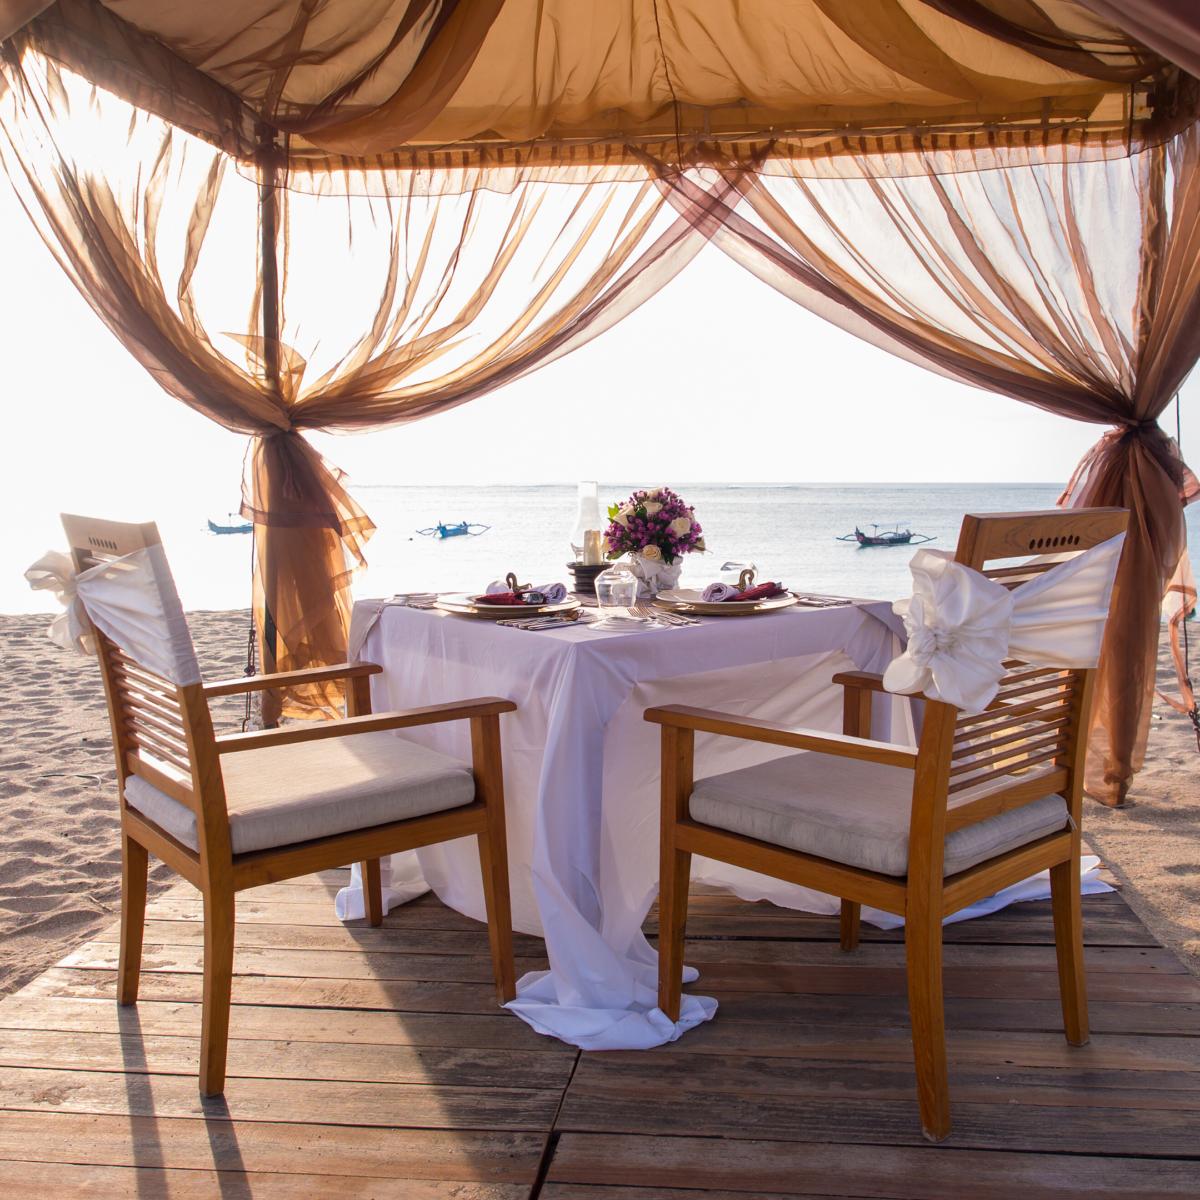 The Most Romantic Destinations to Visit